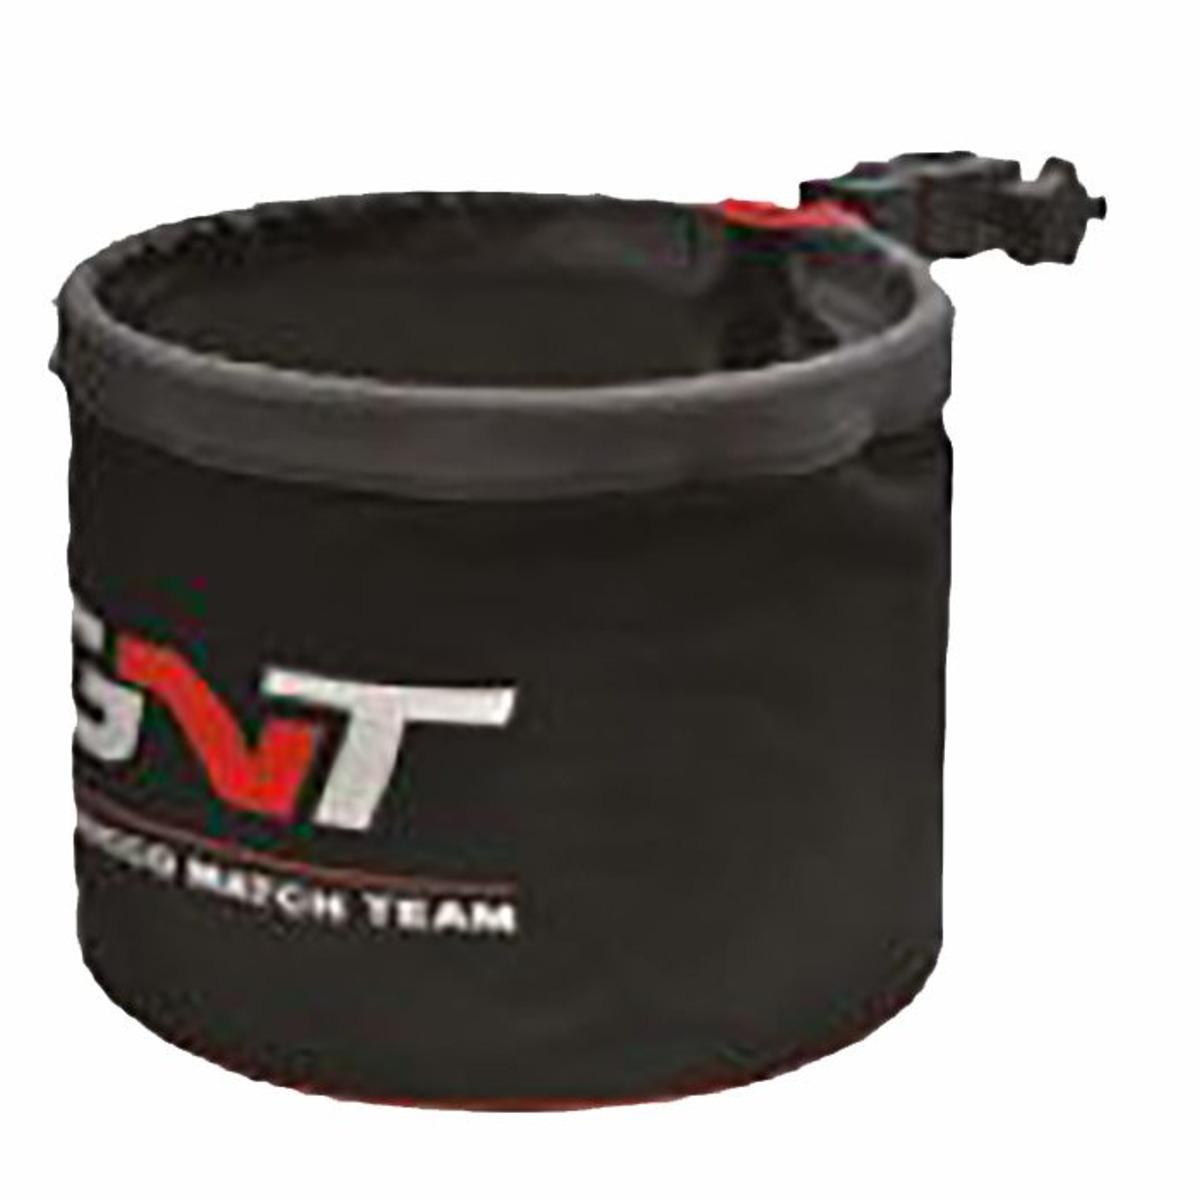 Trabucco Mixer mit Ring Gnt-X36 - 25x20 cm